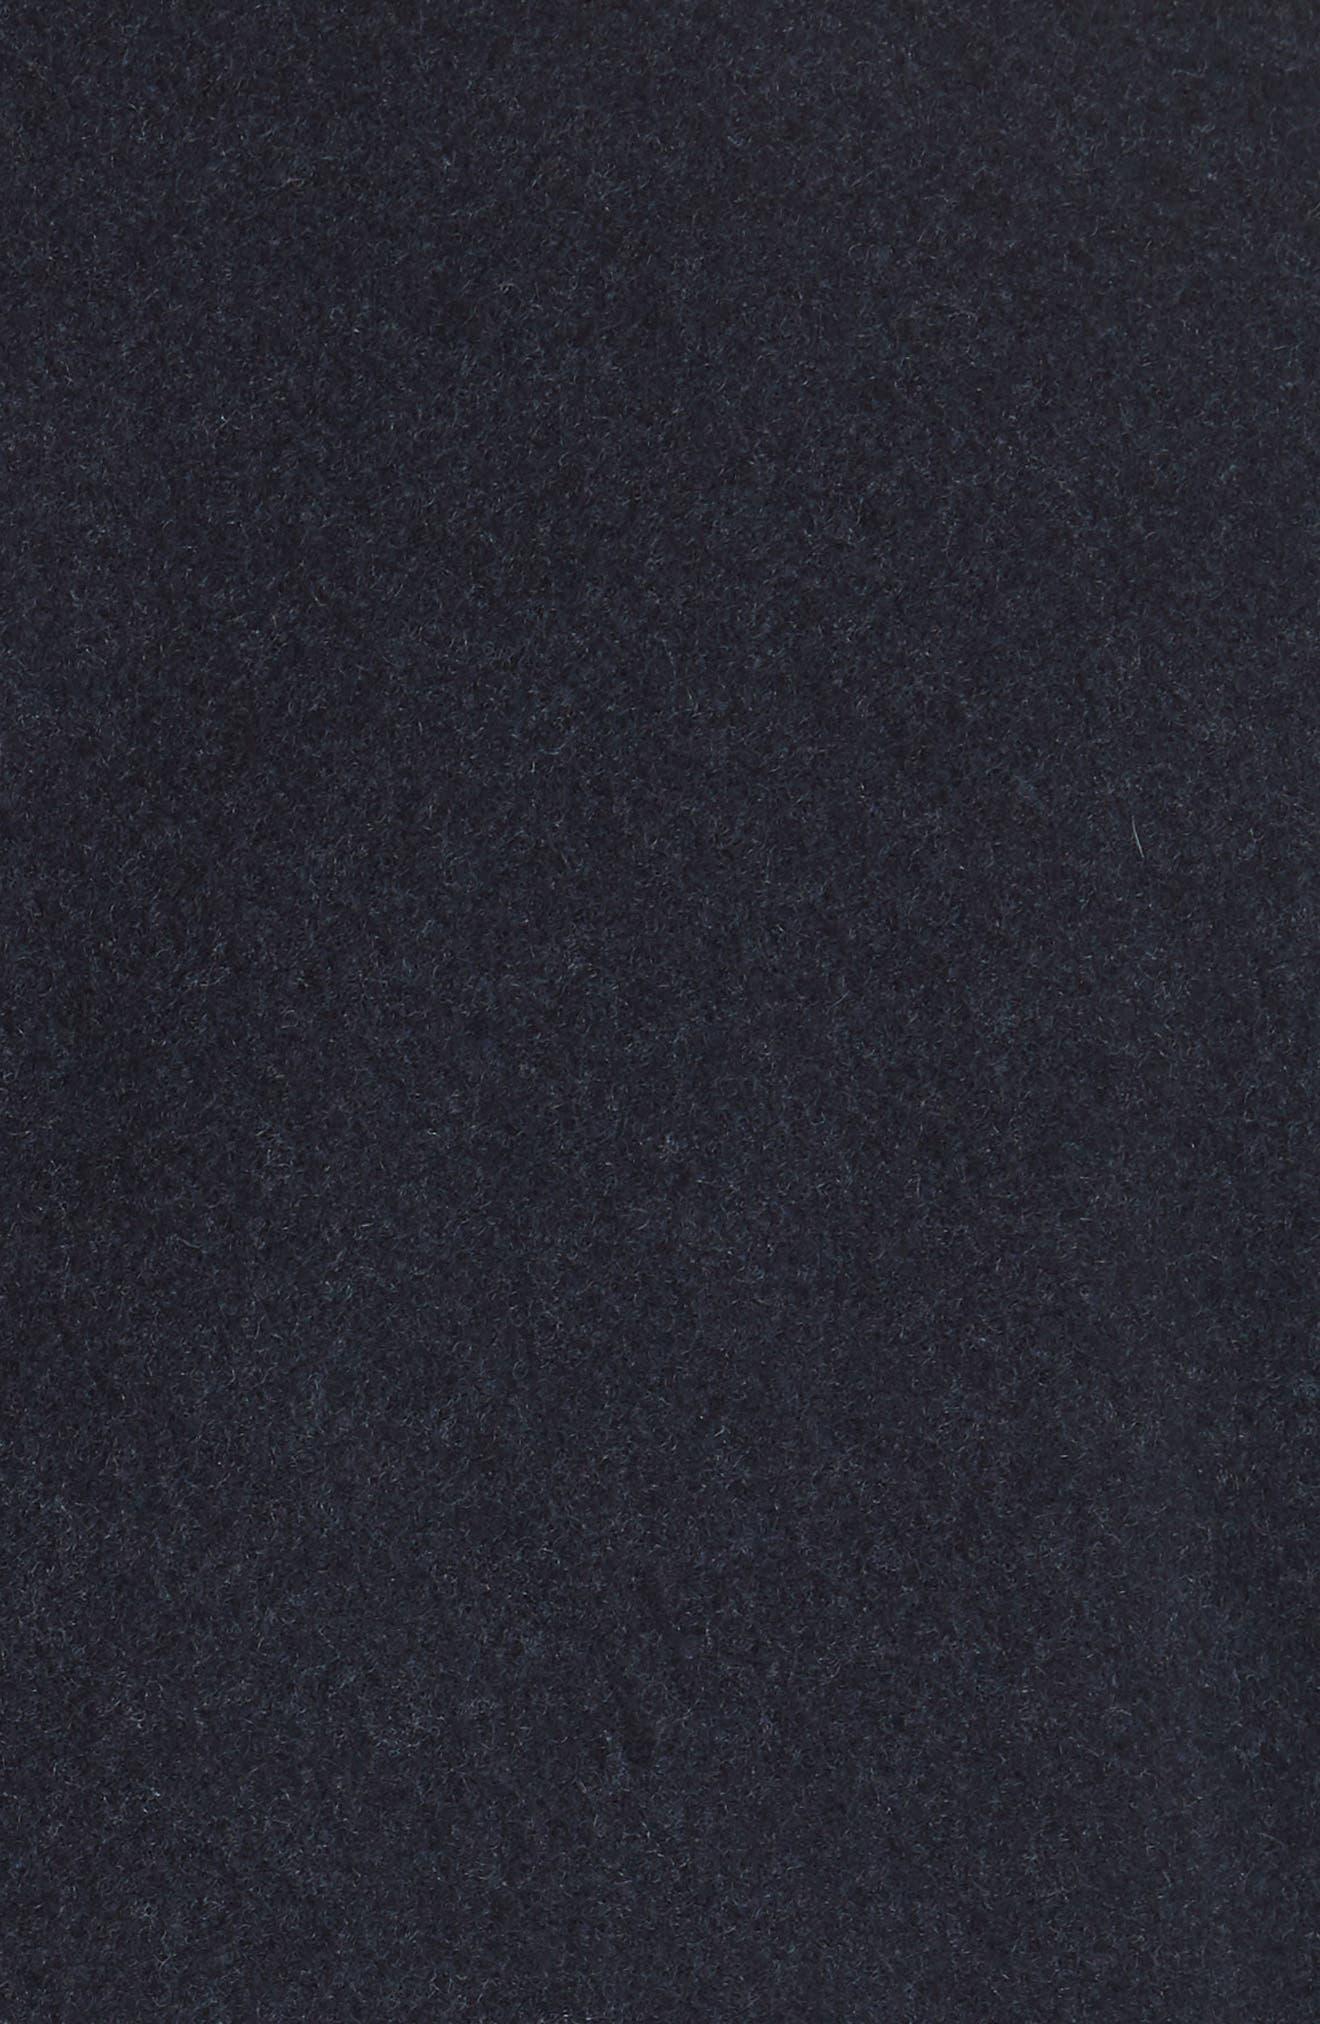 Wool & Cashmere Coat,                             Alternate thumbnail 6, color,                             NAVY